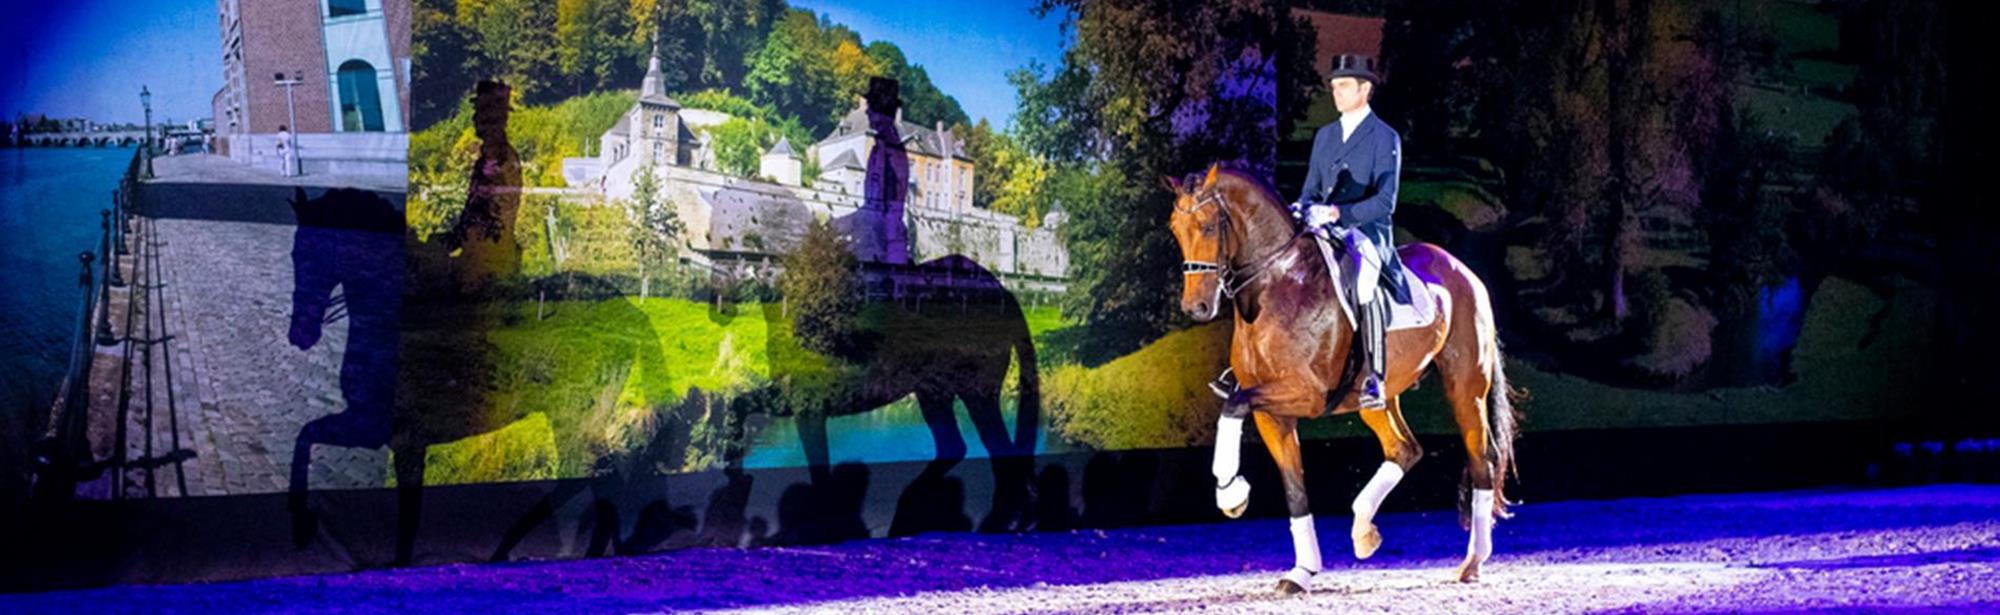 Limburgs Paardensport Gala